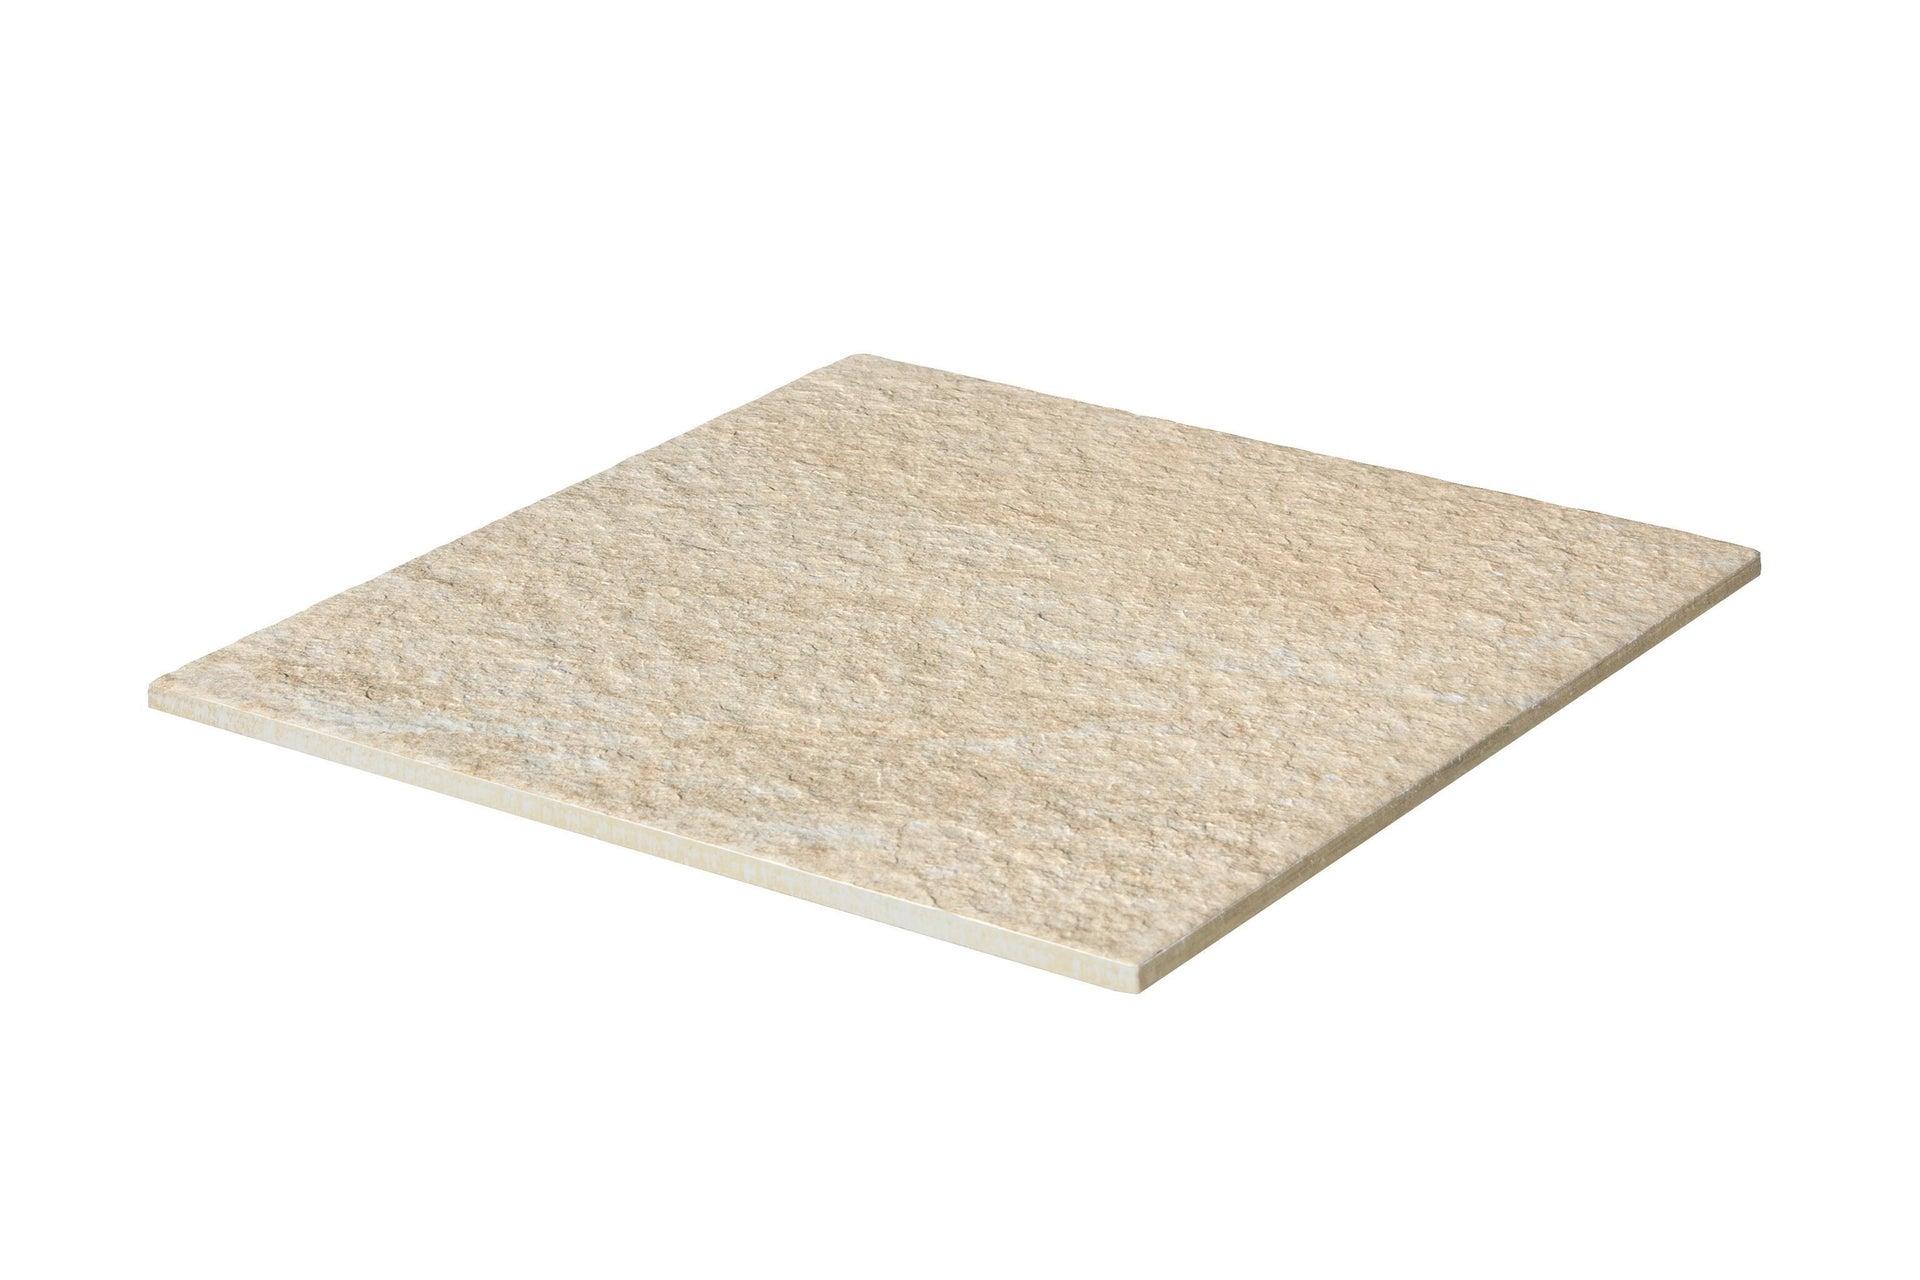 Piastrella da pavimento Walk 32.5 x 32.5 cm sp. 9 mm PEI 3/5 beige - 6